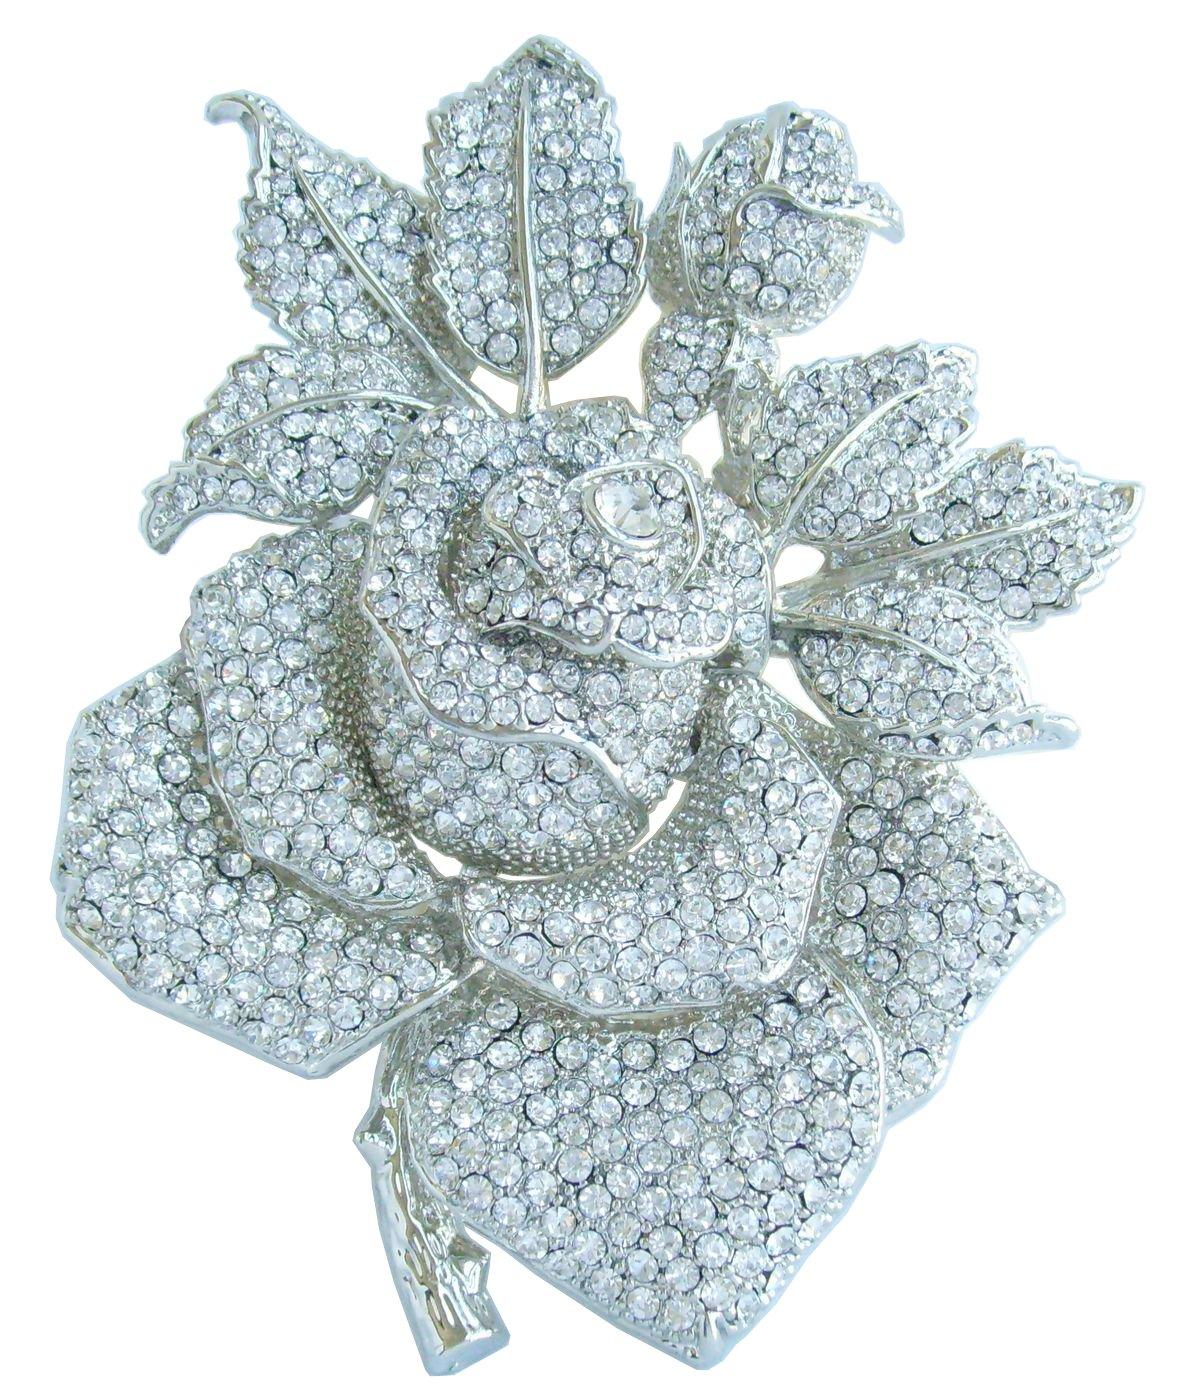 Sindary Gorgeous Wedding 5.32'' Big Rose Flower Brooch Pin Austrian Crystal Pendant BZ2994 (Silver-Tone Clear)